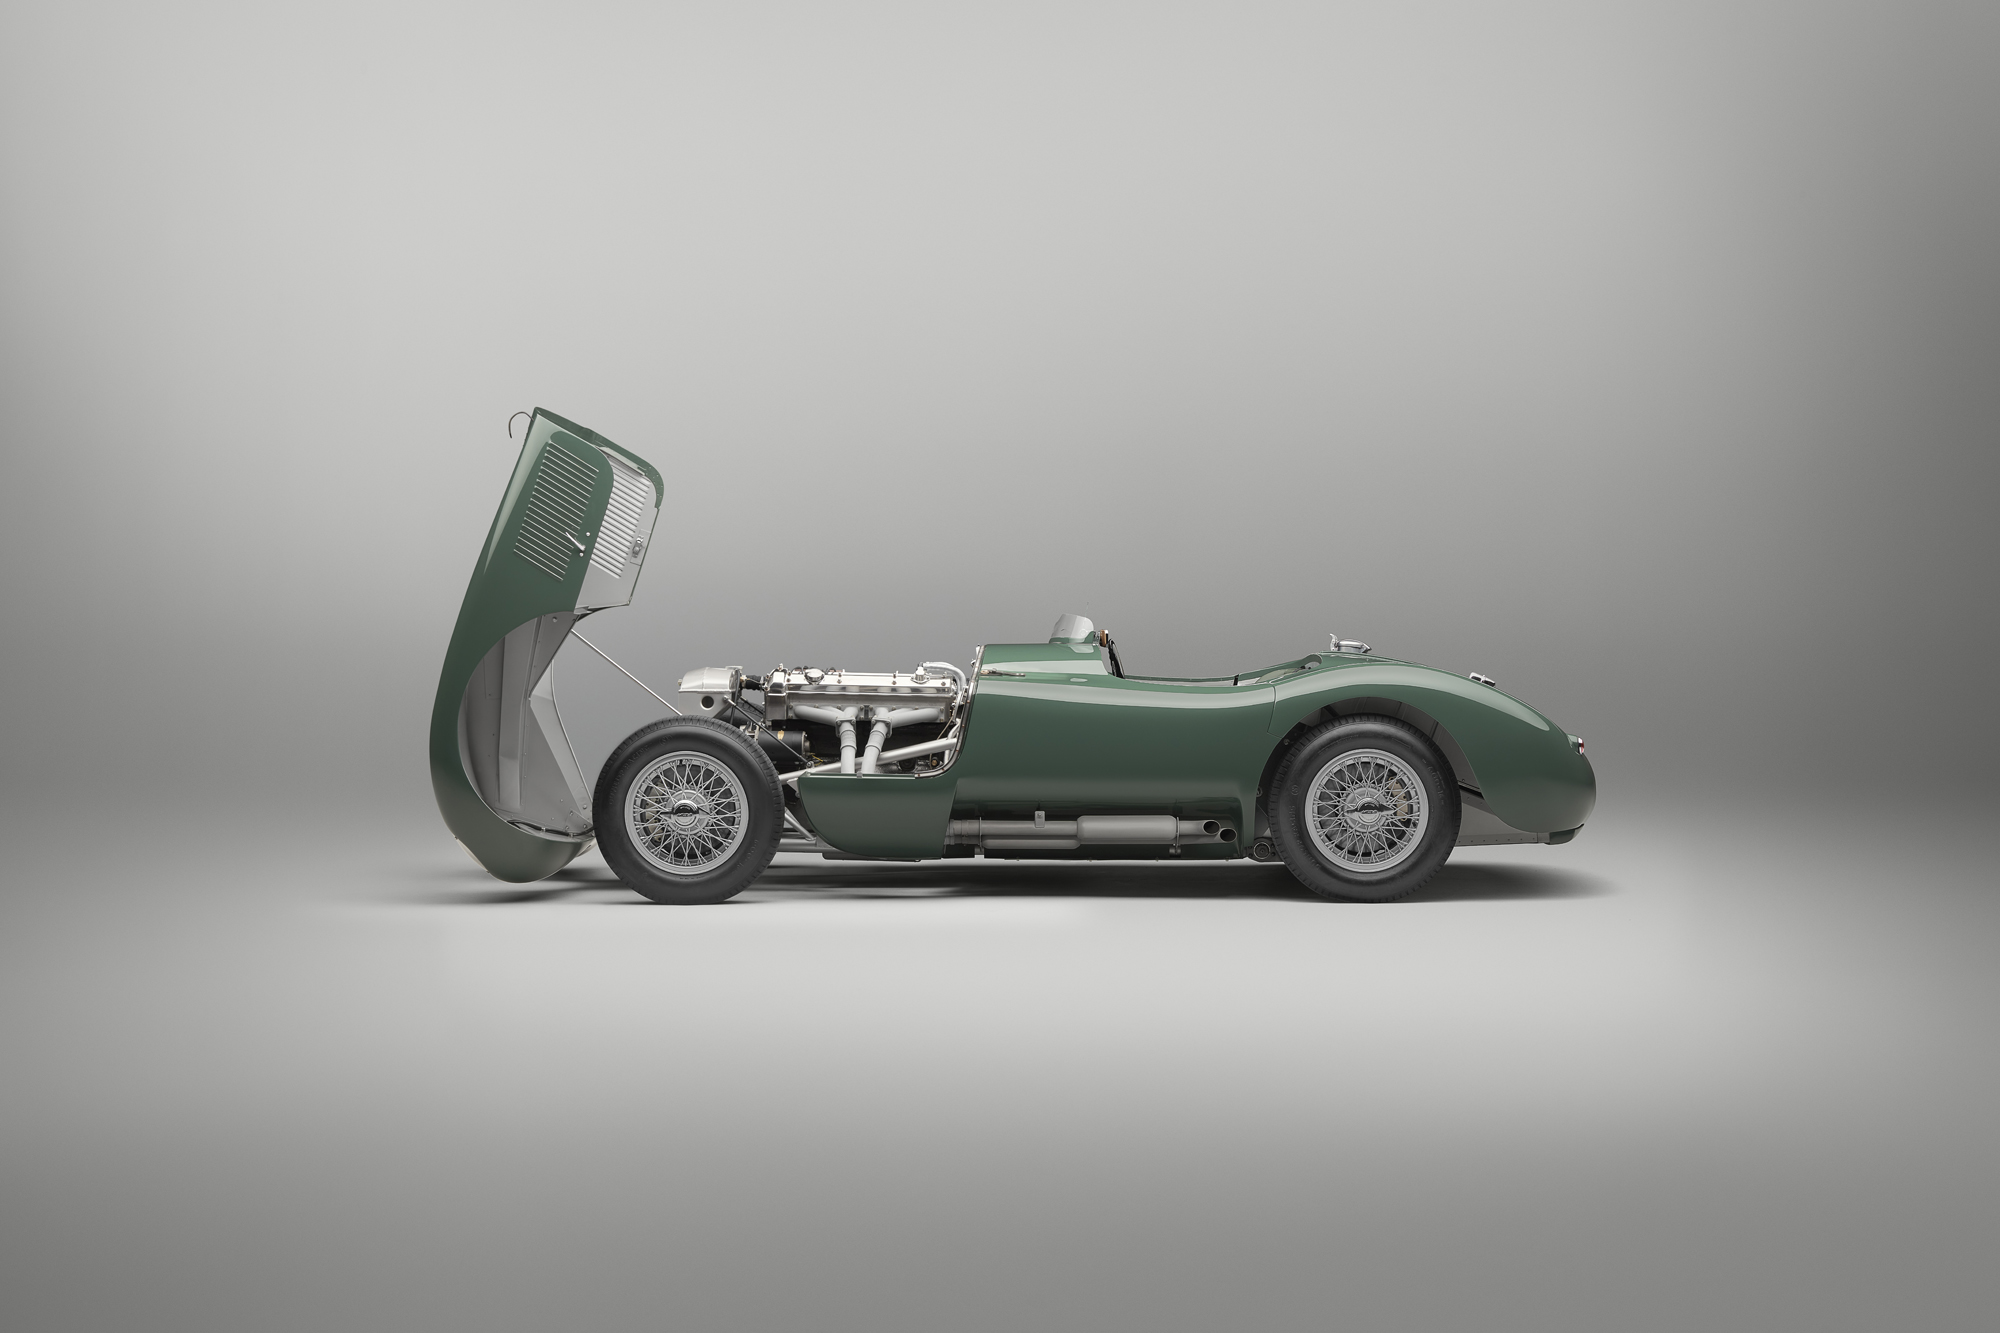 Jaguar C-type continuation hood open